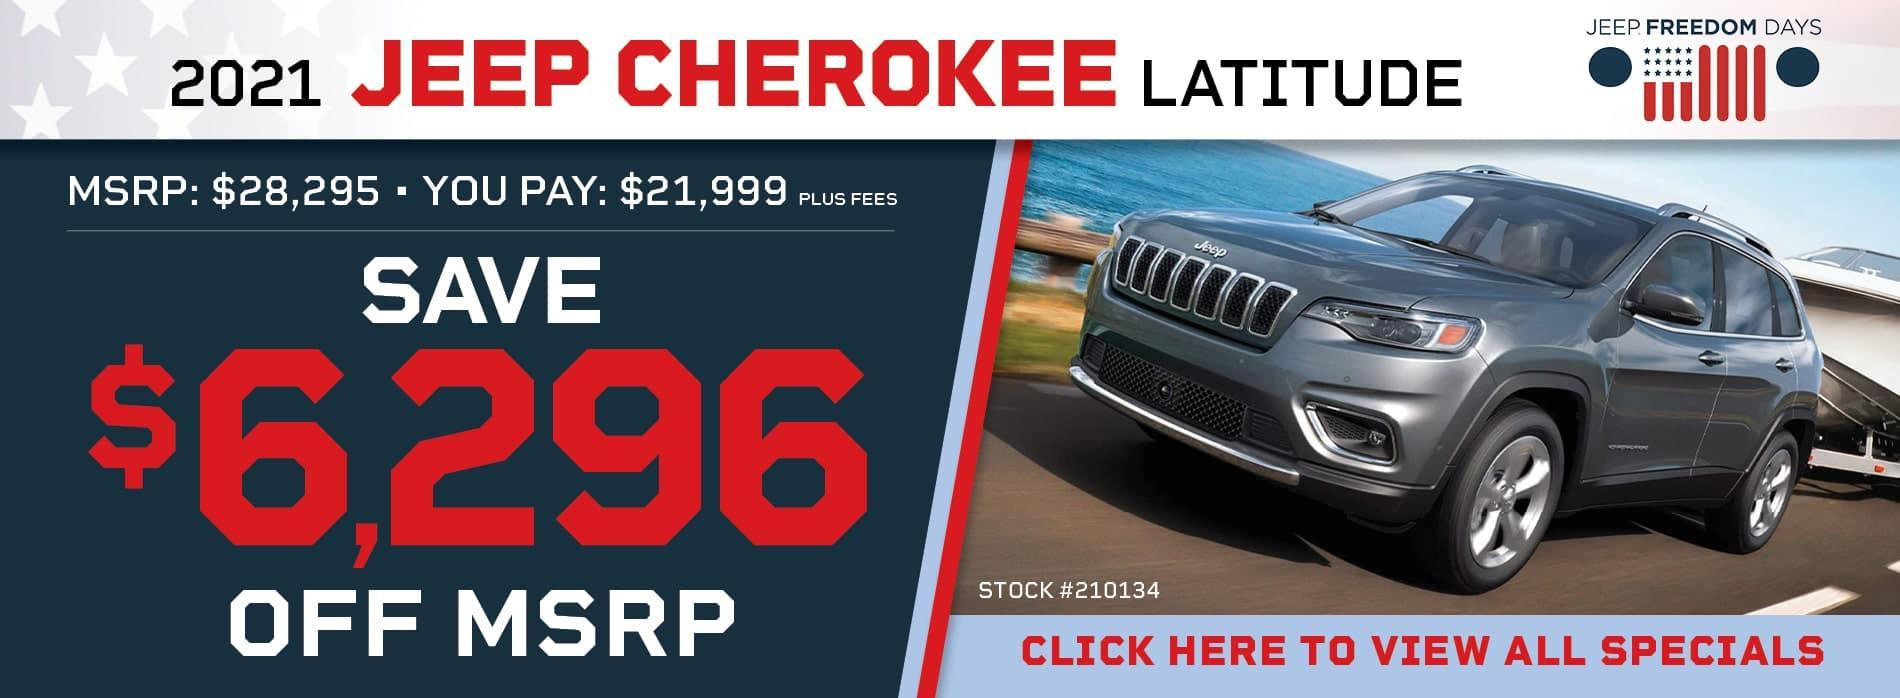 060421 Jeep Banners2-min